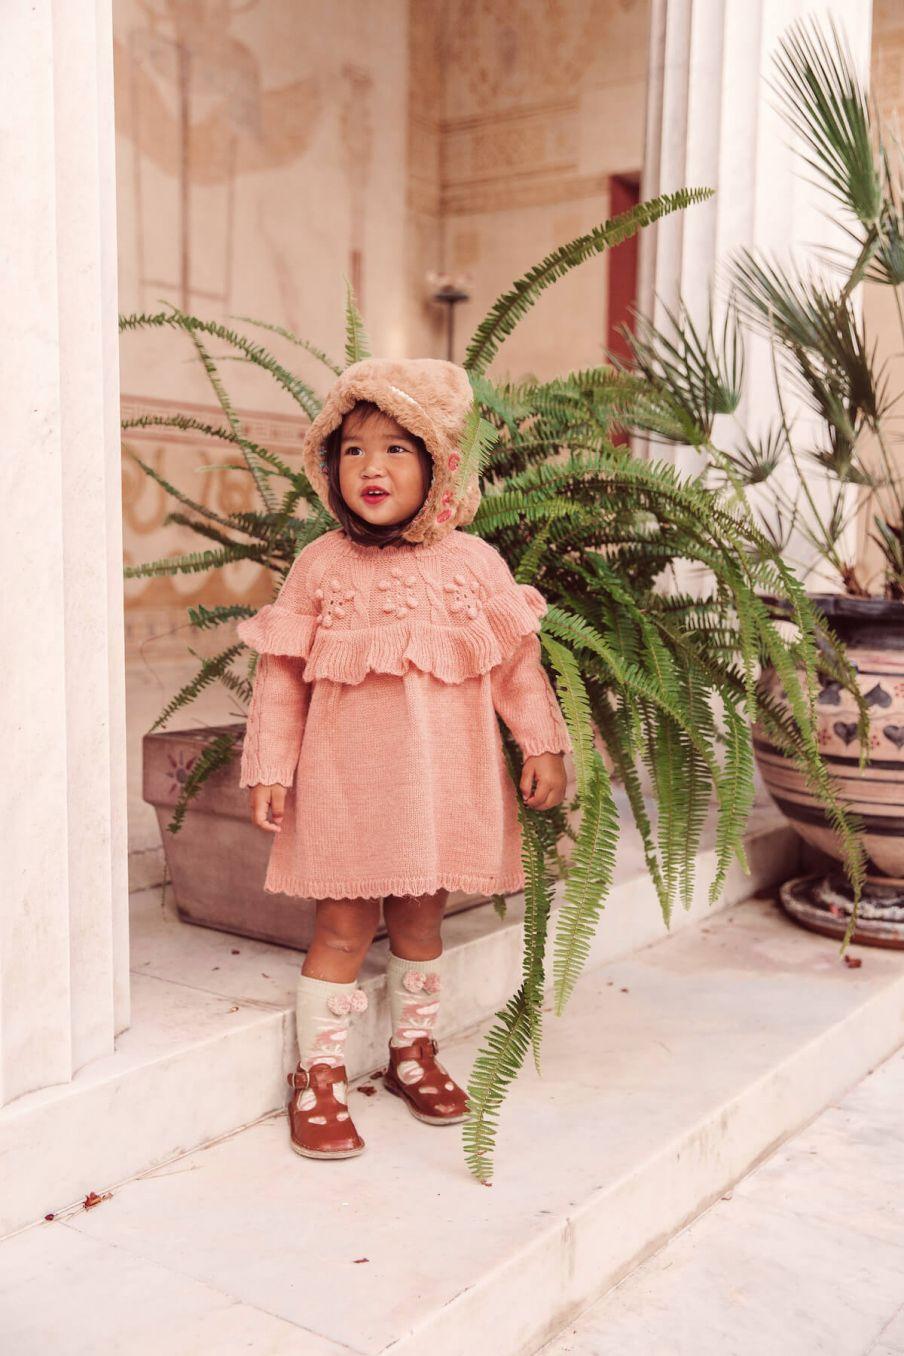 boheme chic vintage robe bébé fille szevana sienna